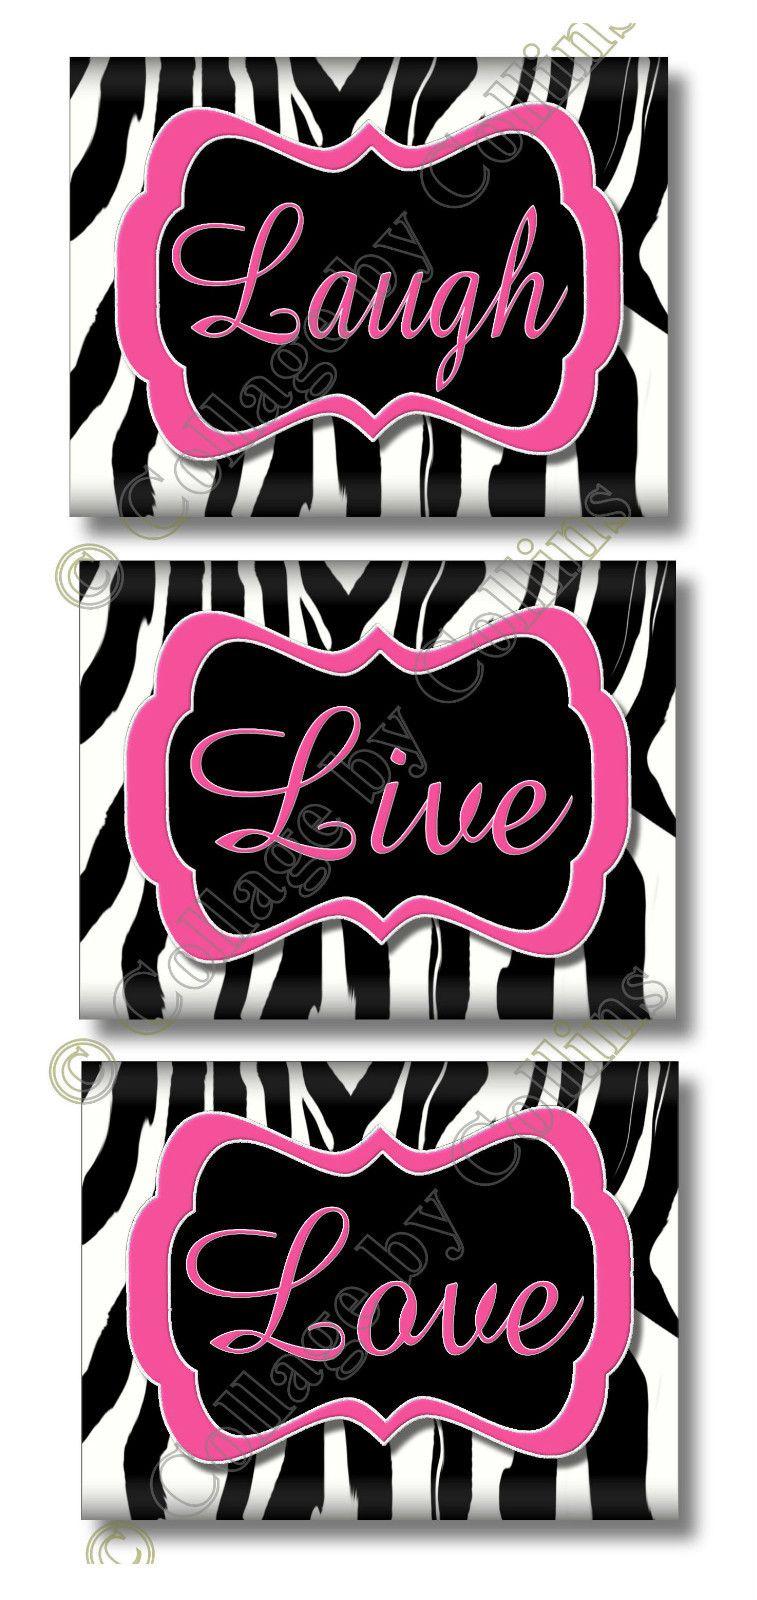 3 Hot Pink Zebra Print Design Live Love Laugh Quote Art Room Wall Decor 5x7